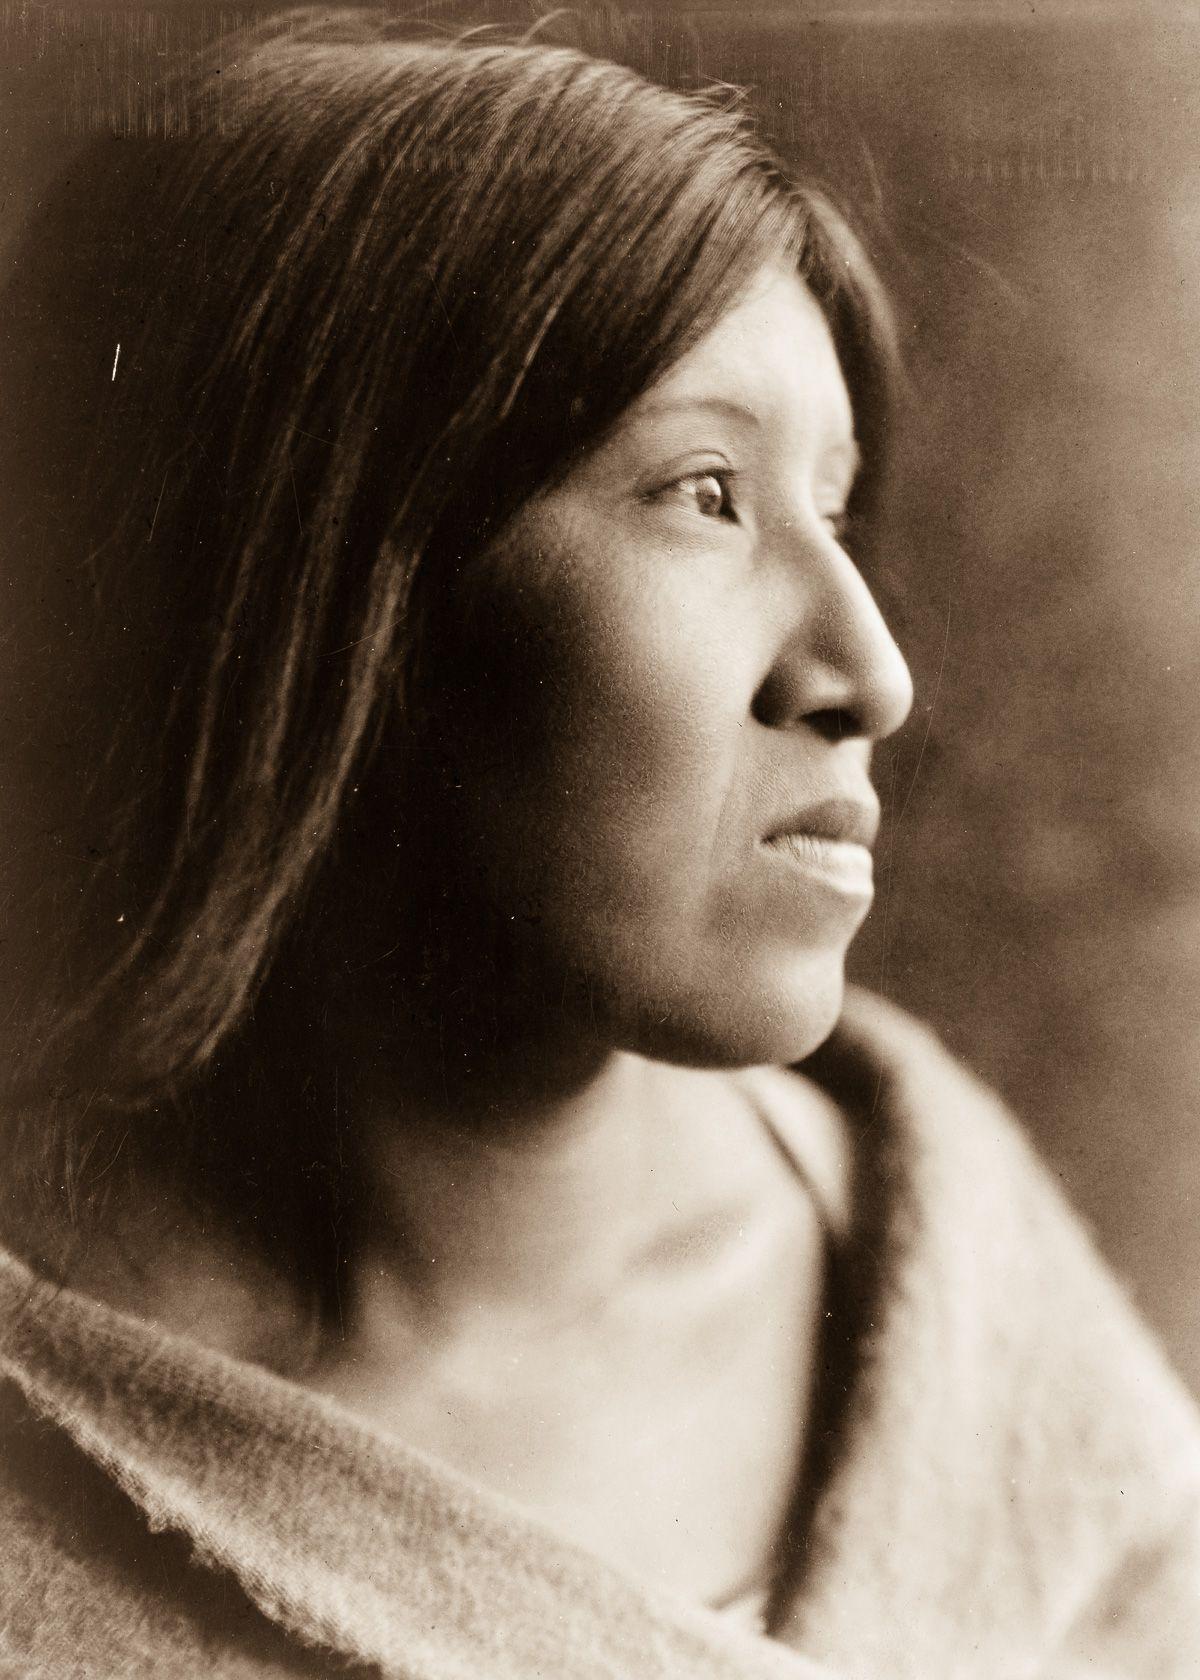 A Cahuilla woman,  1924.  ©EDWARD S. CURTIS/LIBRARY OF CONGRESS